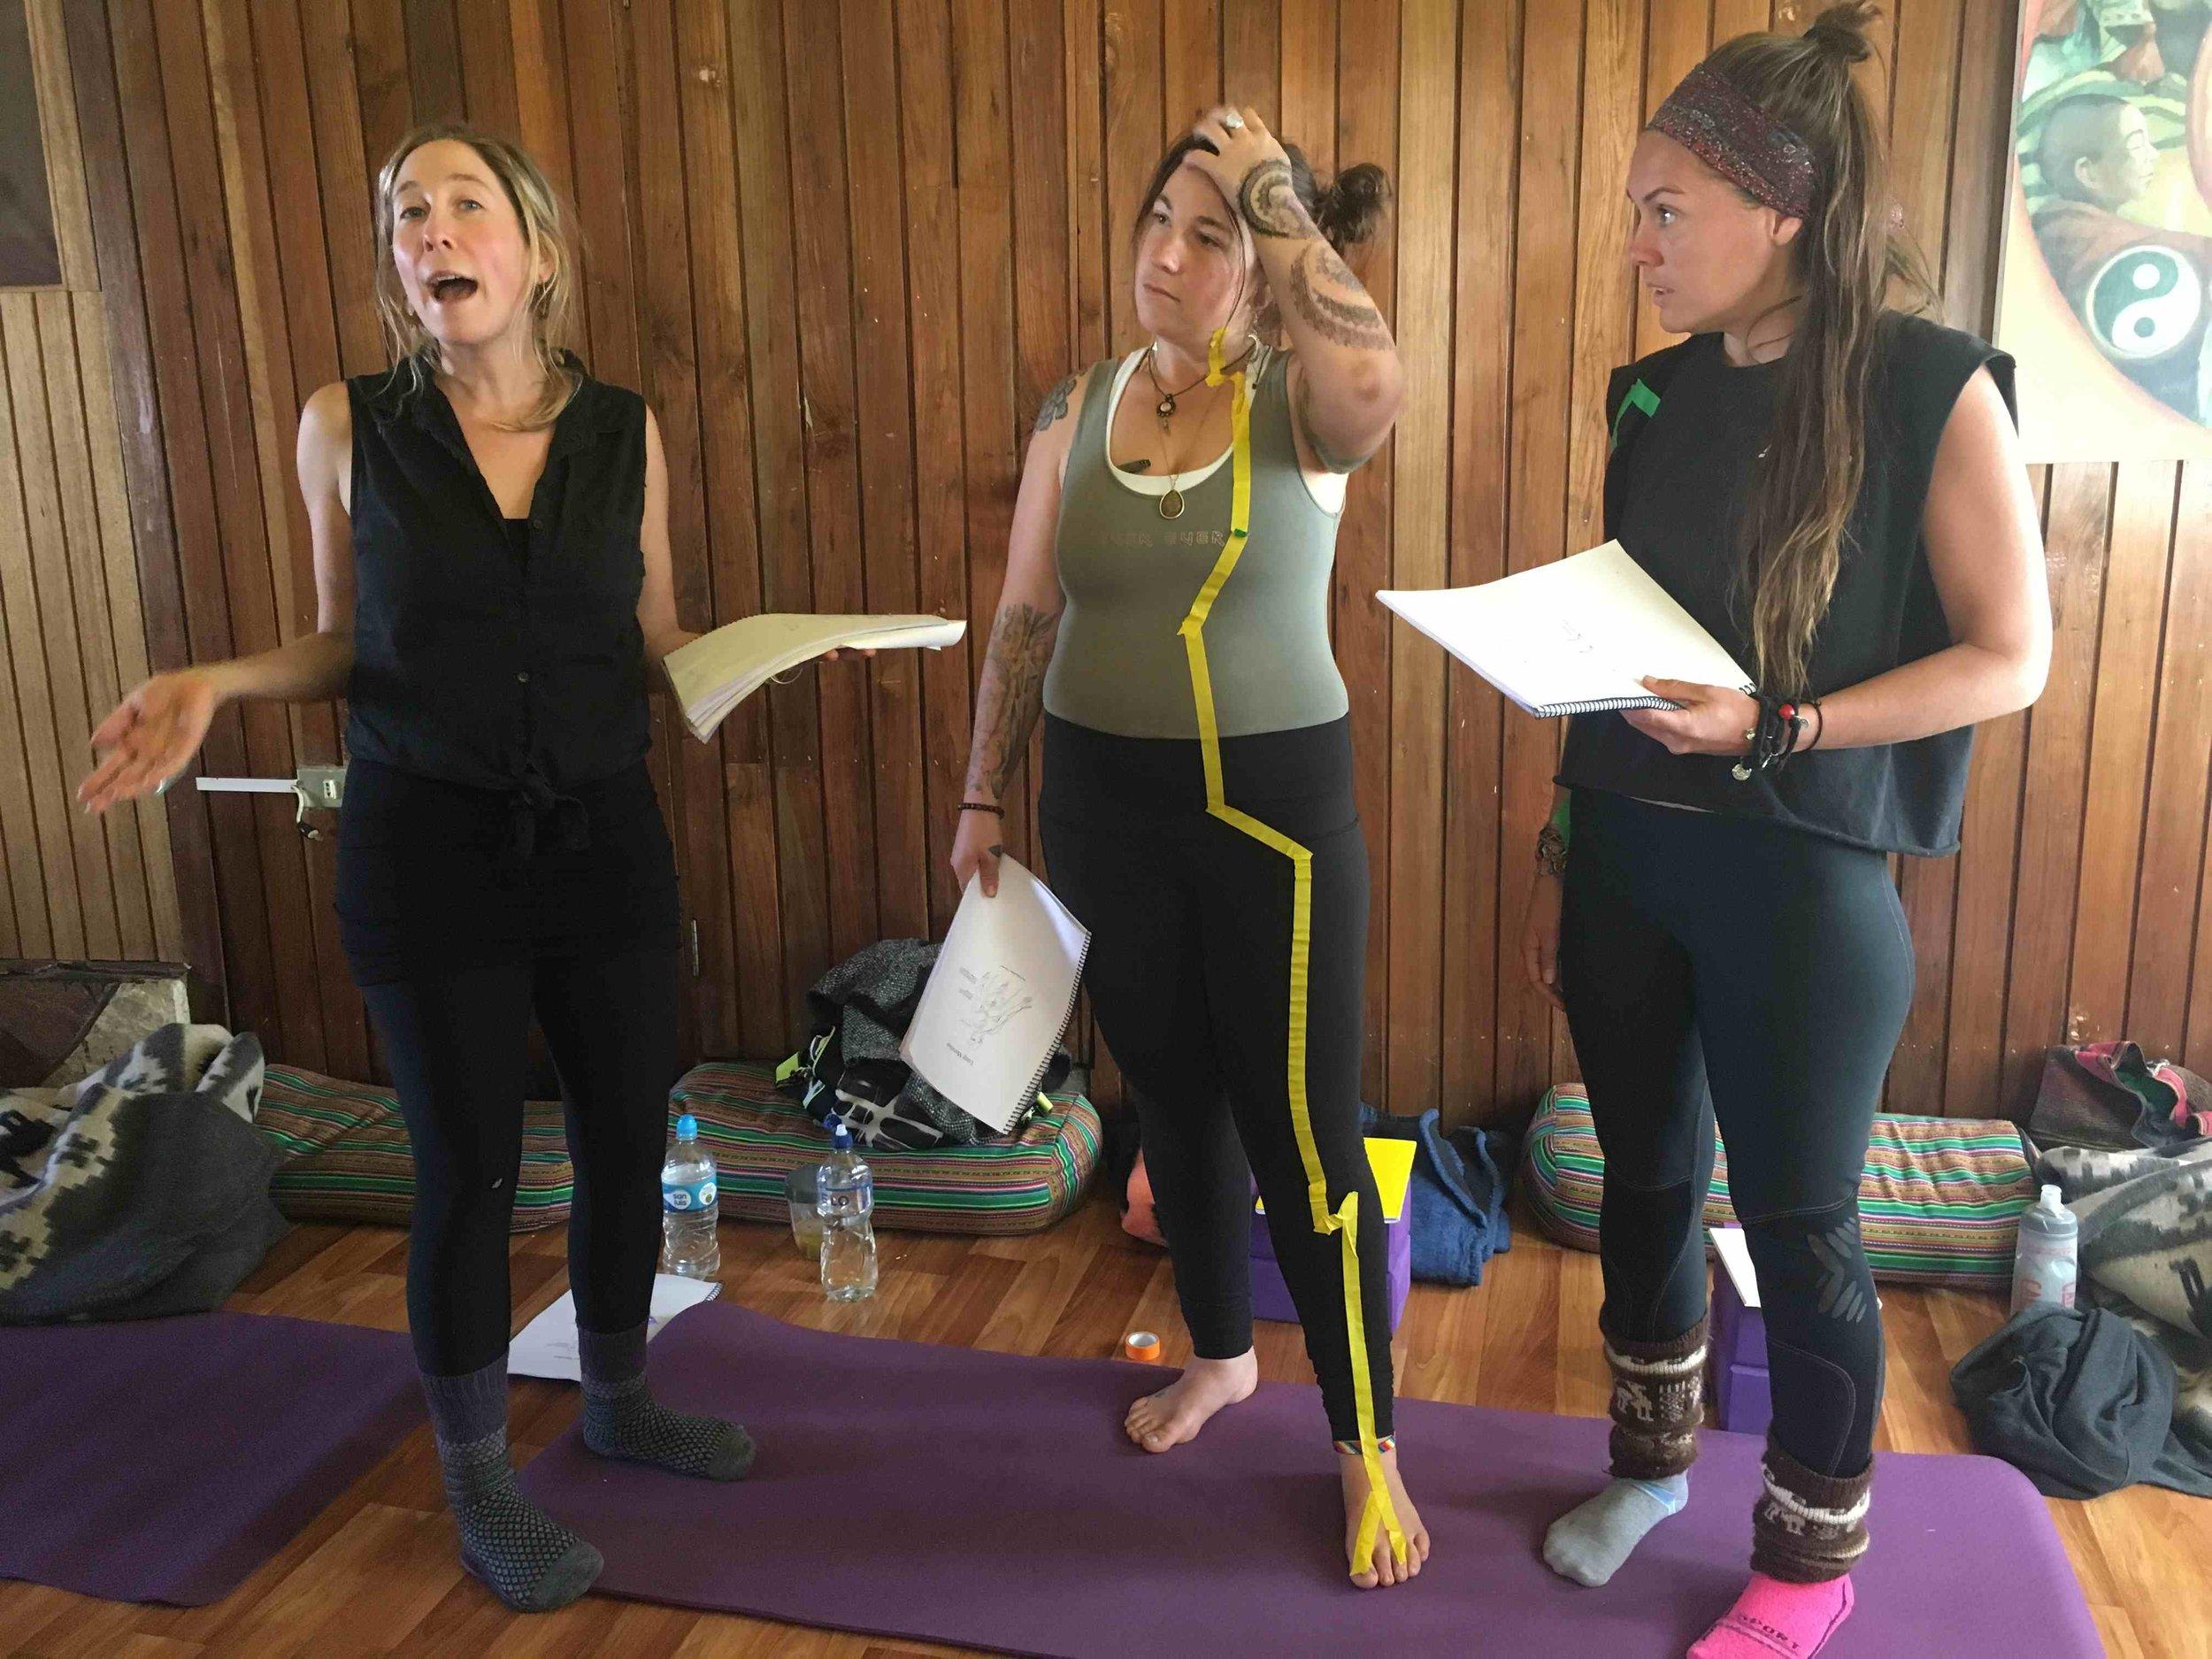 yin-yoga-teacher-training-kali-basman-tulum-retreat.jpg